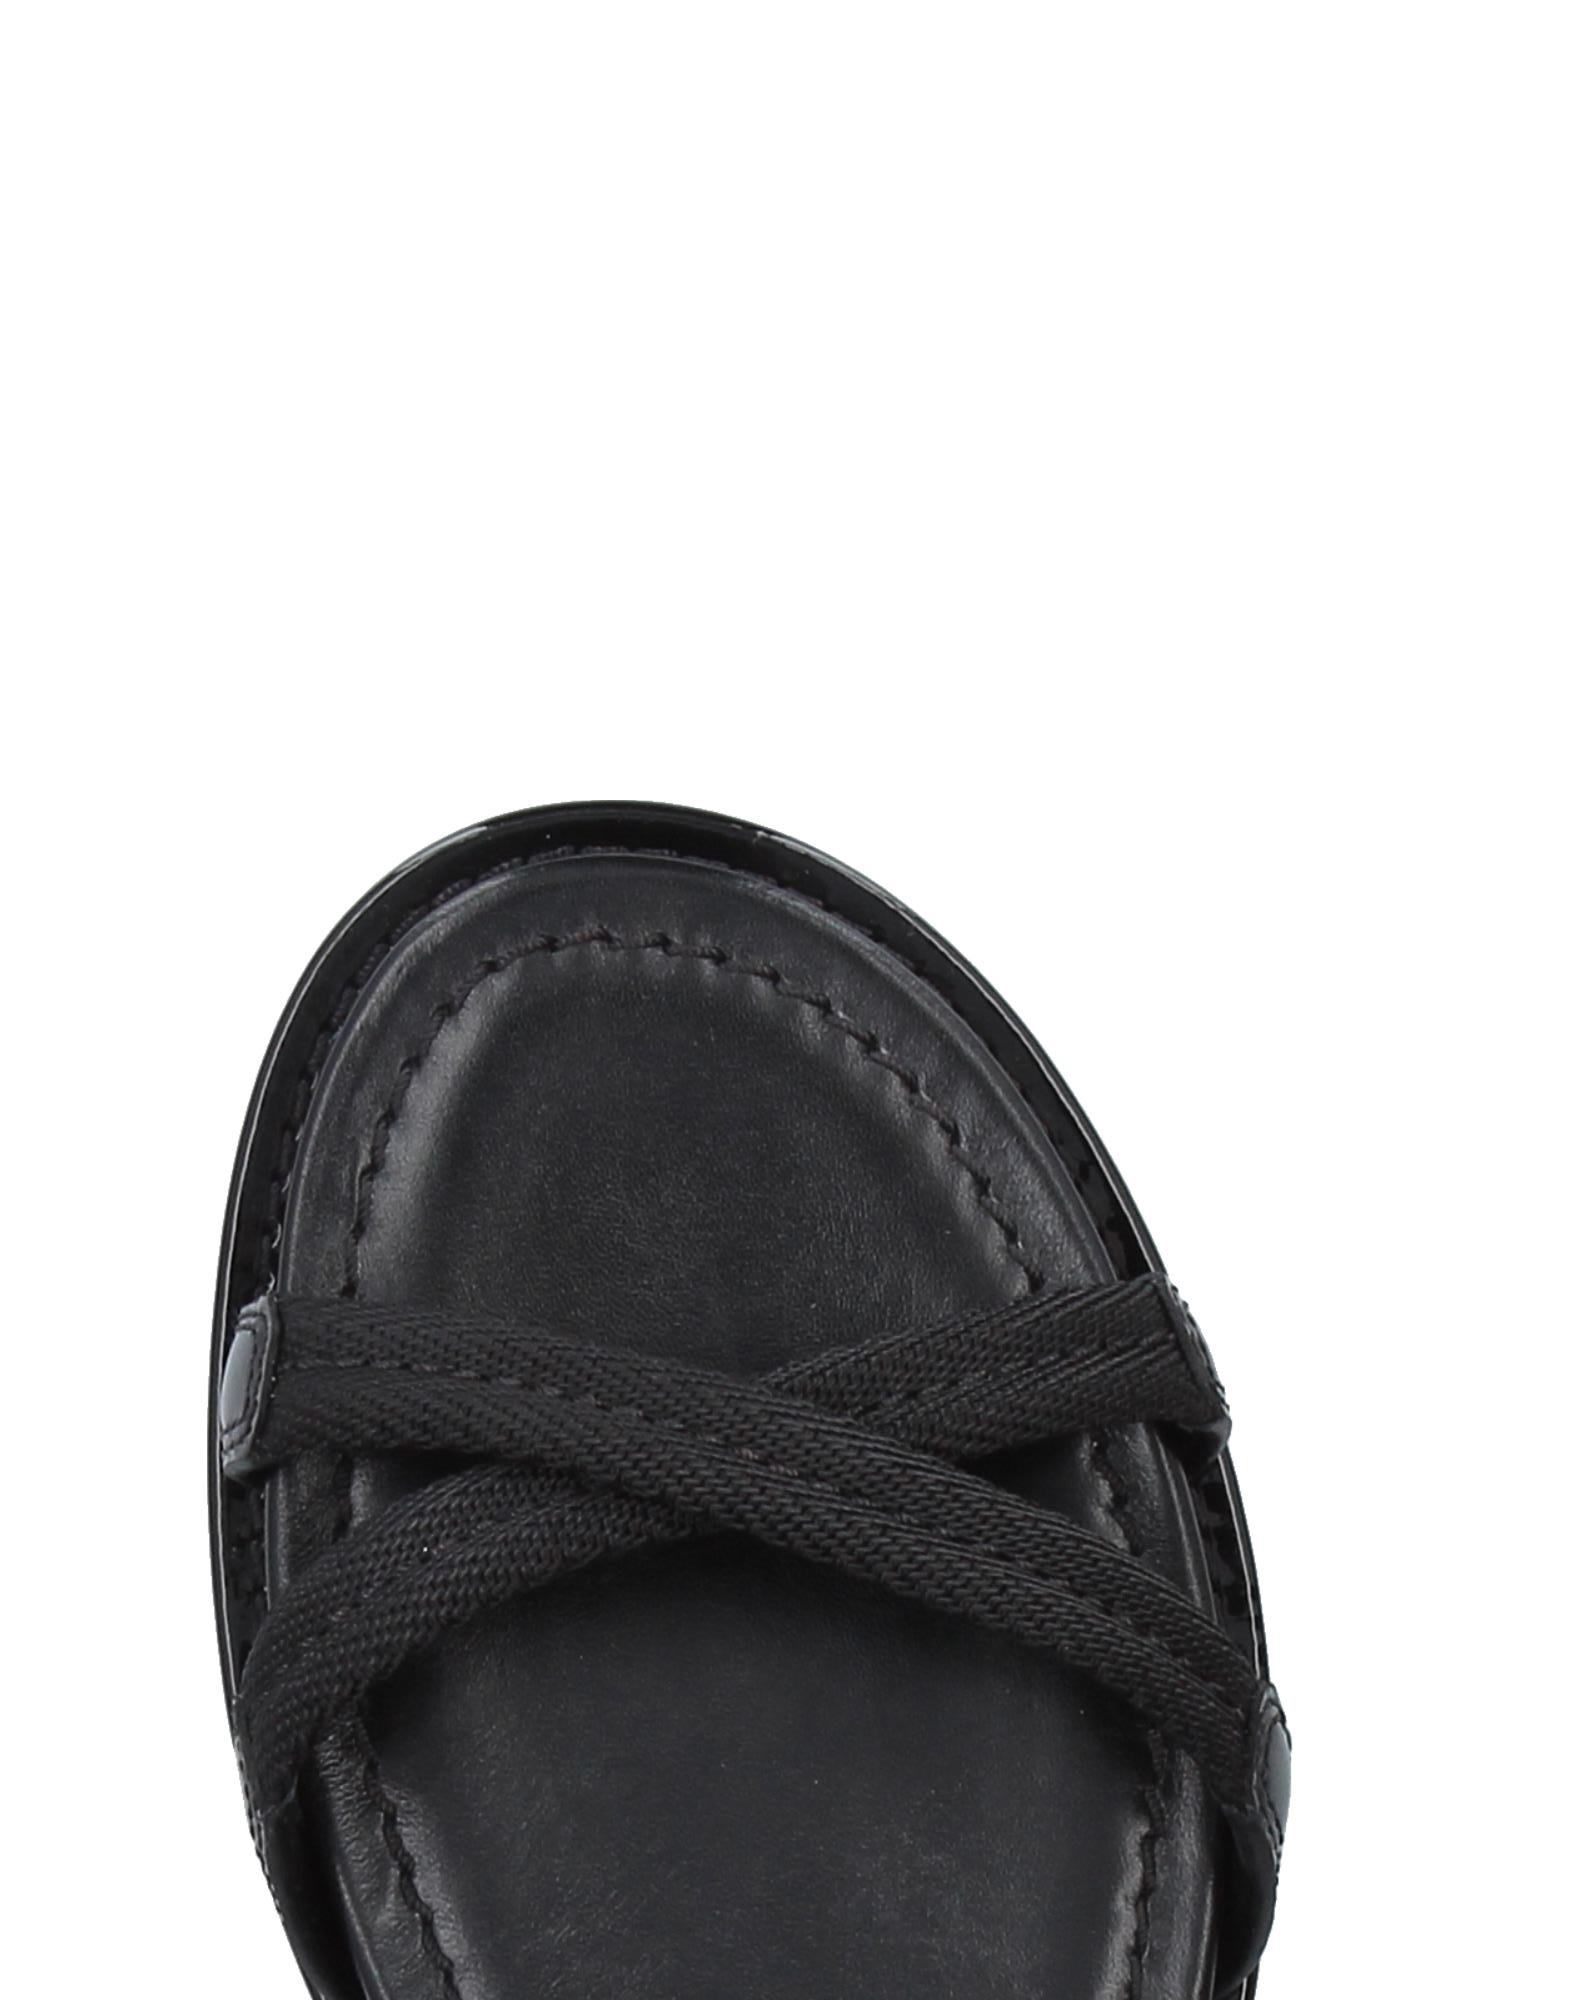 Rabatt Schuhe Prada Sport Sandalen 11400139OC Damen  11400139OC Sandalen 22b317